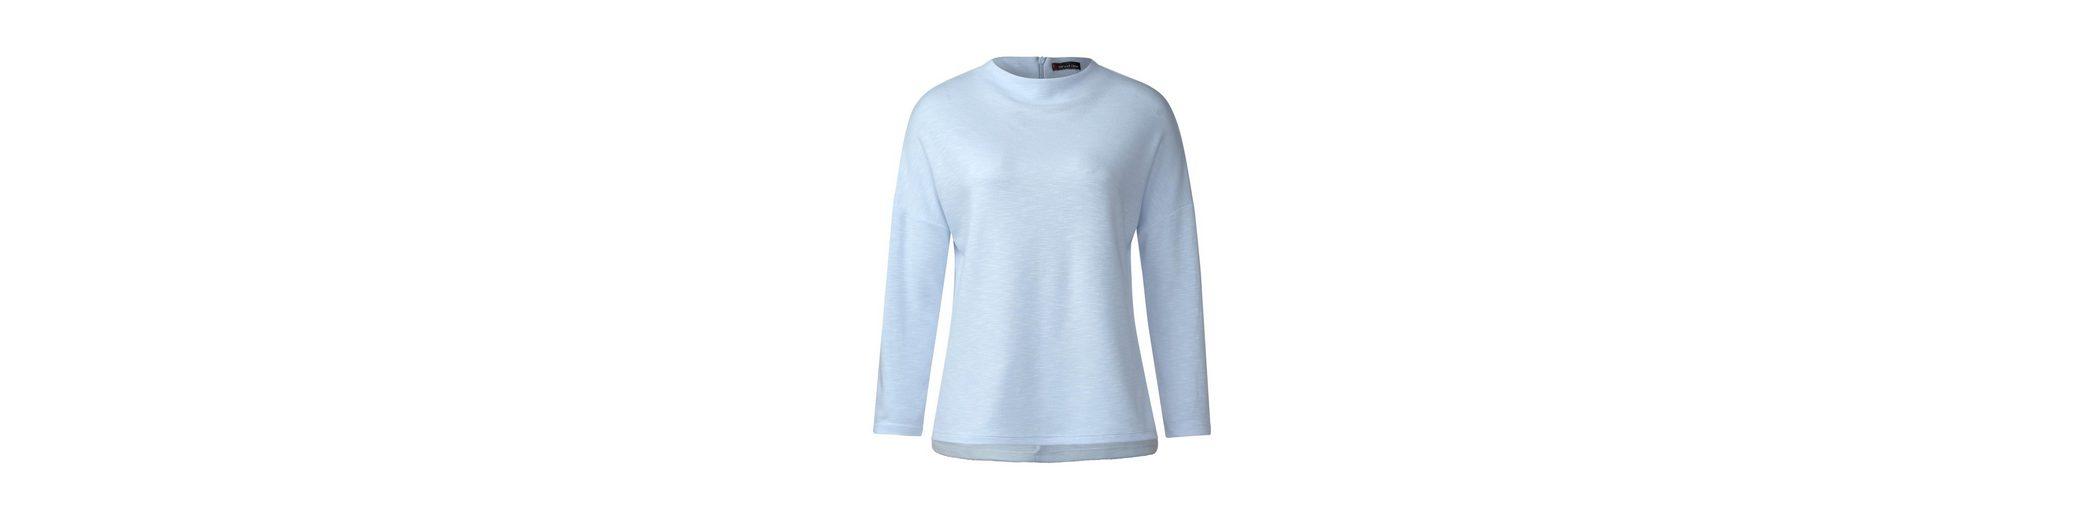 Turtleneck Shirt One Street Softes One One Street Shirt Turtleneck Softes Street Softes Turtleneck 5YUn7qpn